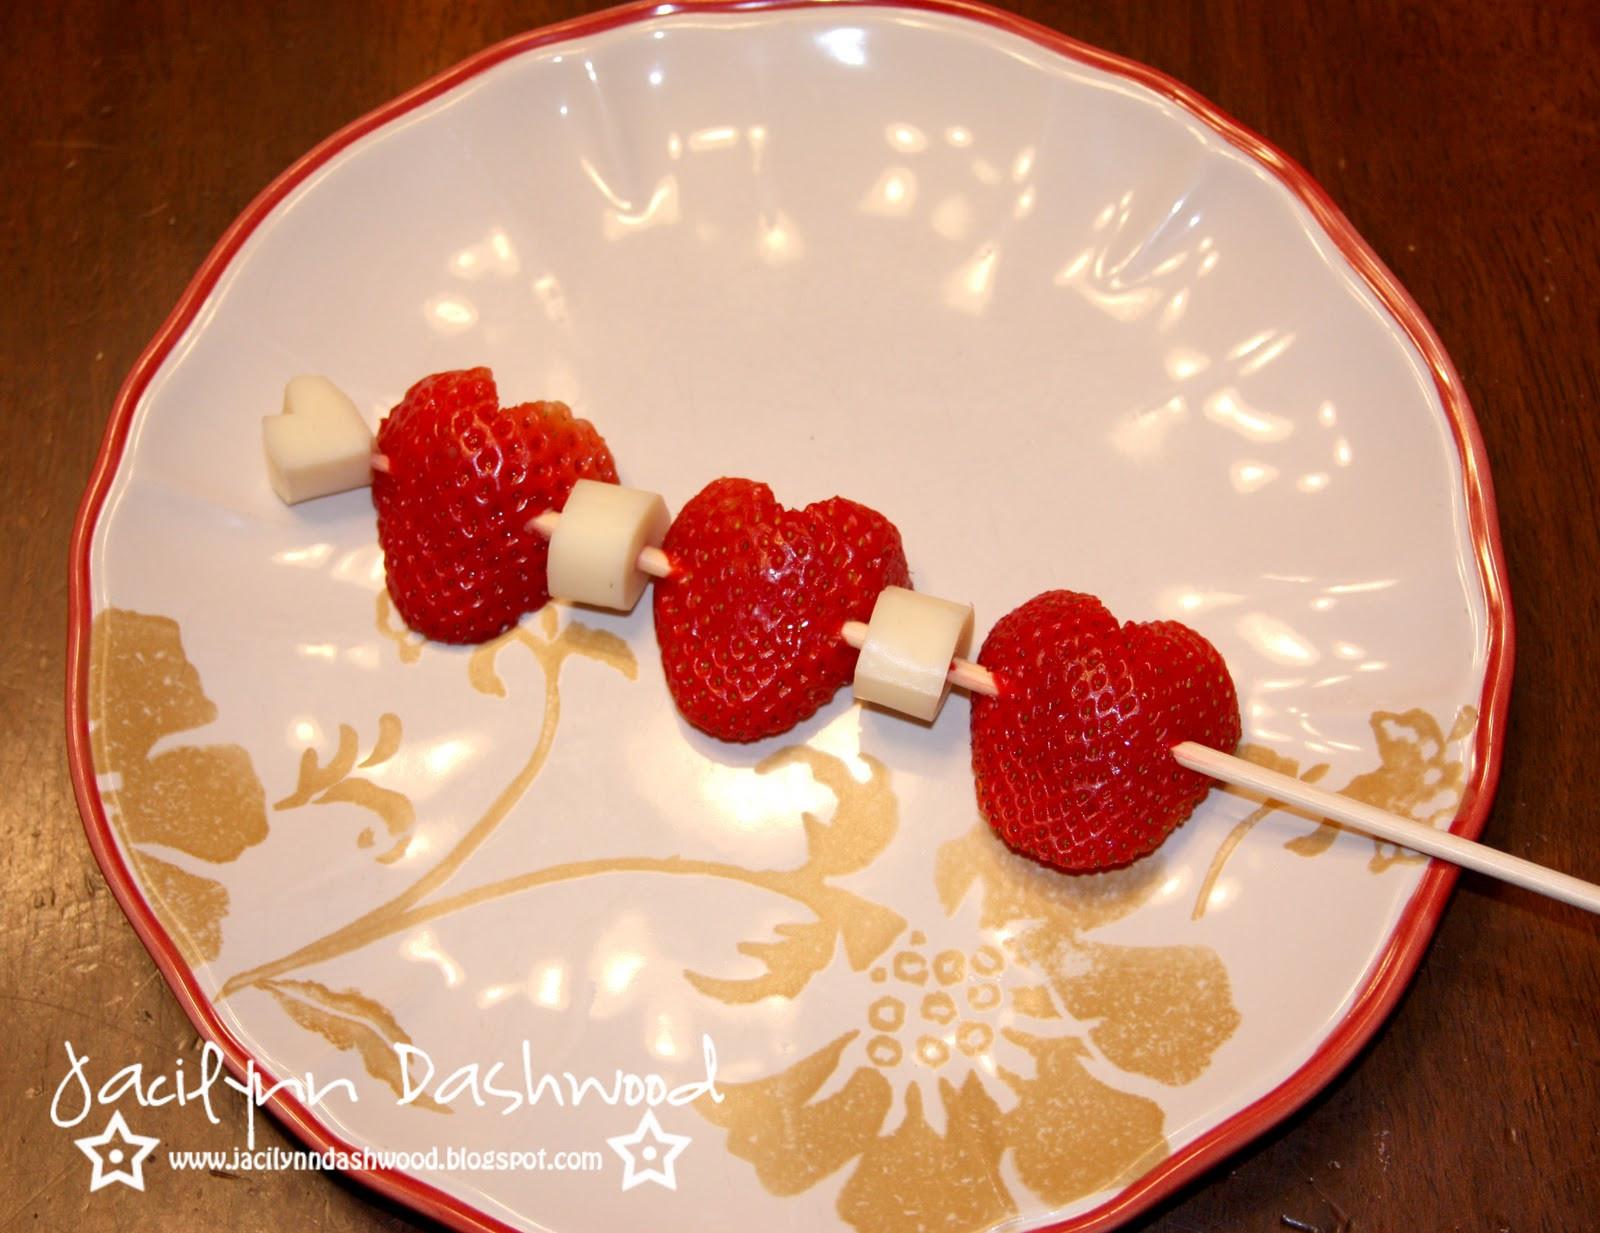 Healthy Valentines Snacks  Jacilynn Dashwood Healthy School Valentine s snack